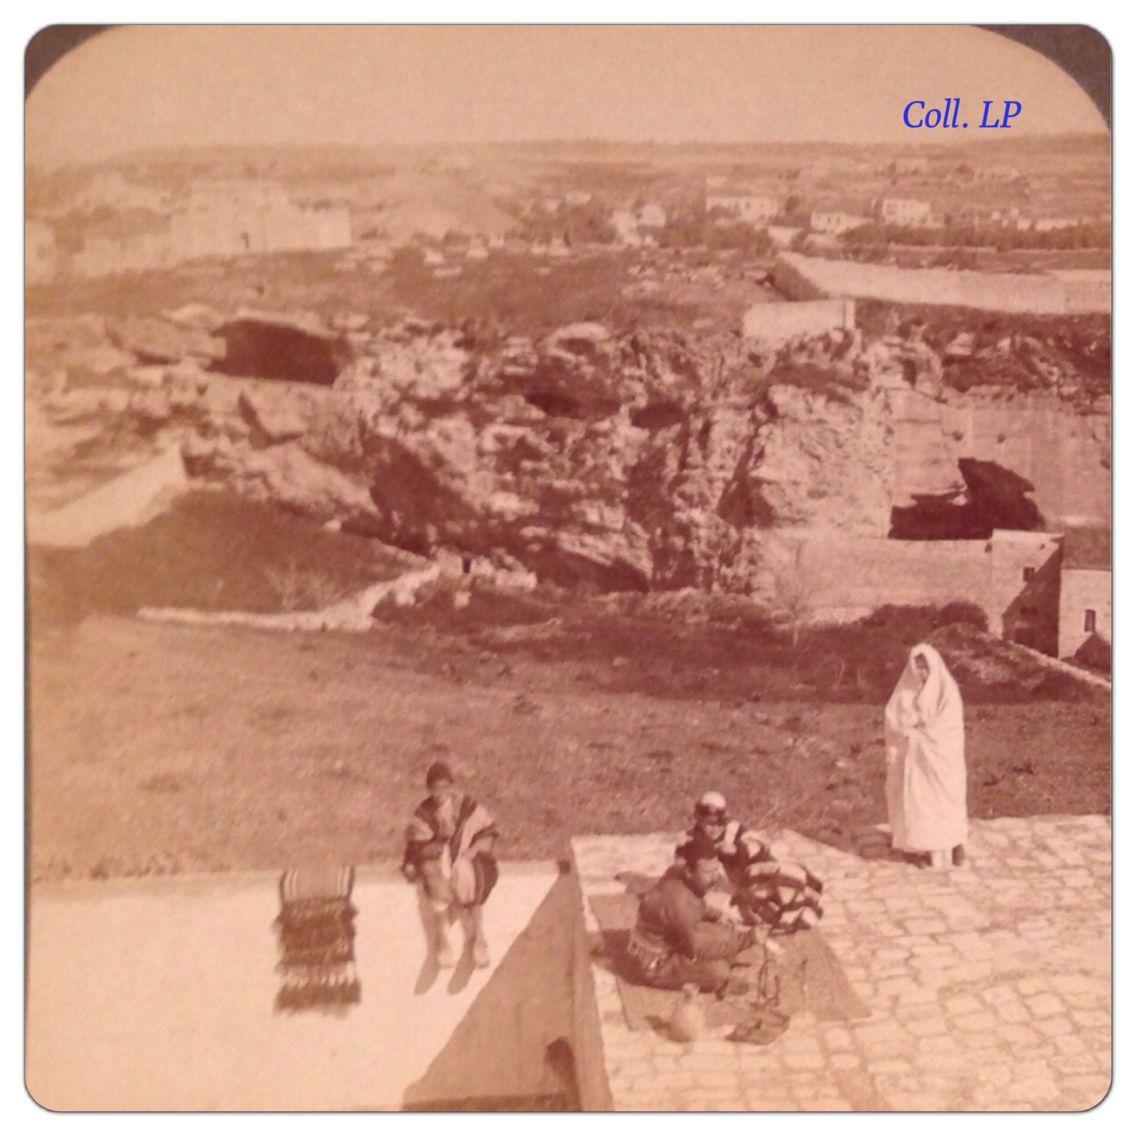 Suite de la promenade en Israël au XIX siècle 2/2